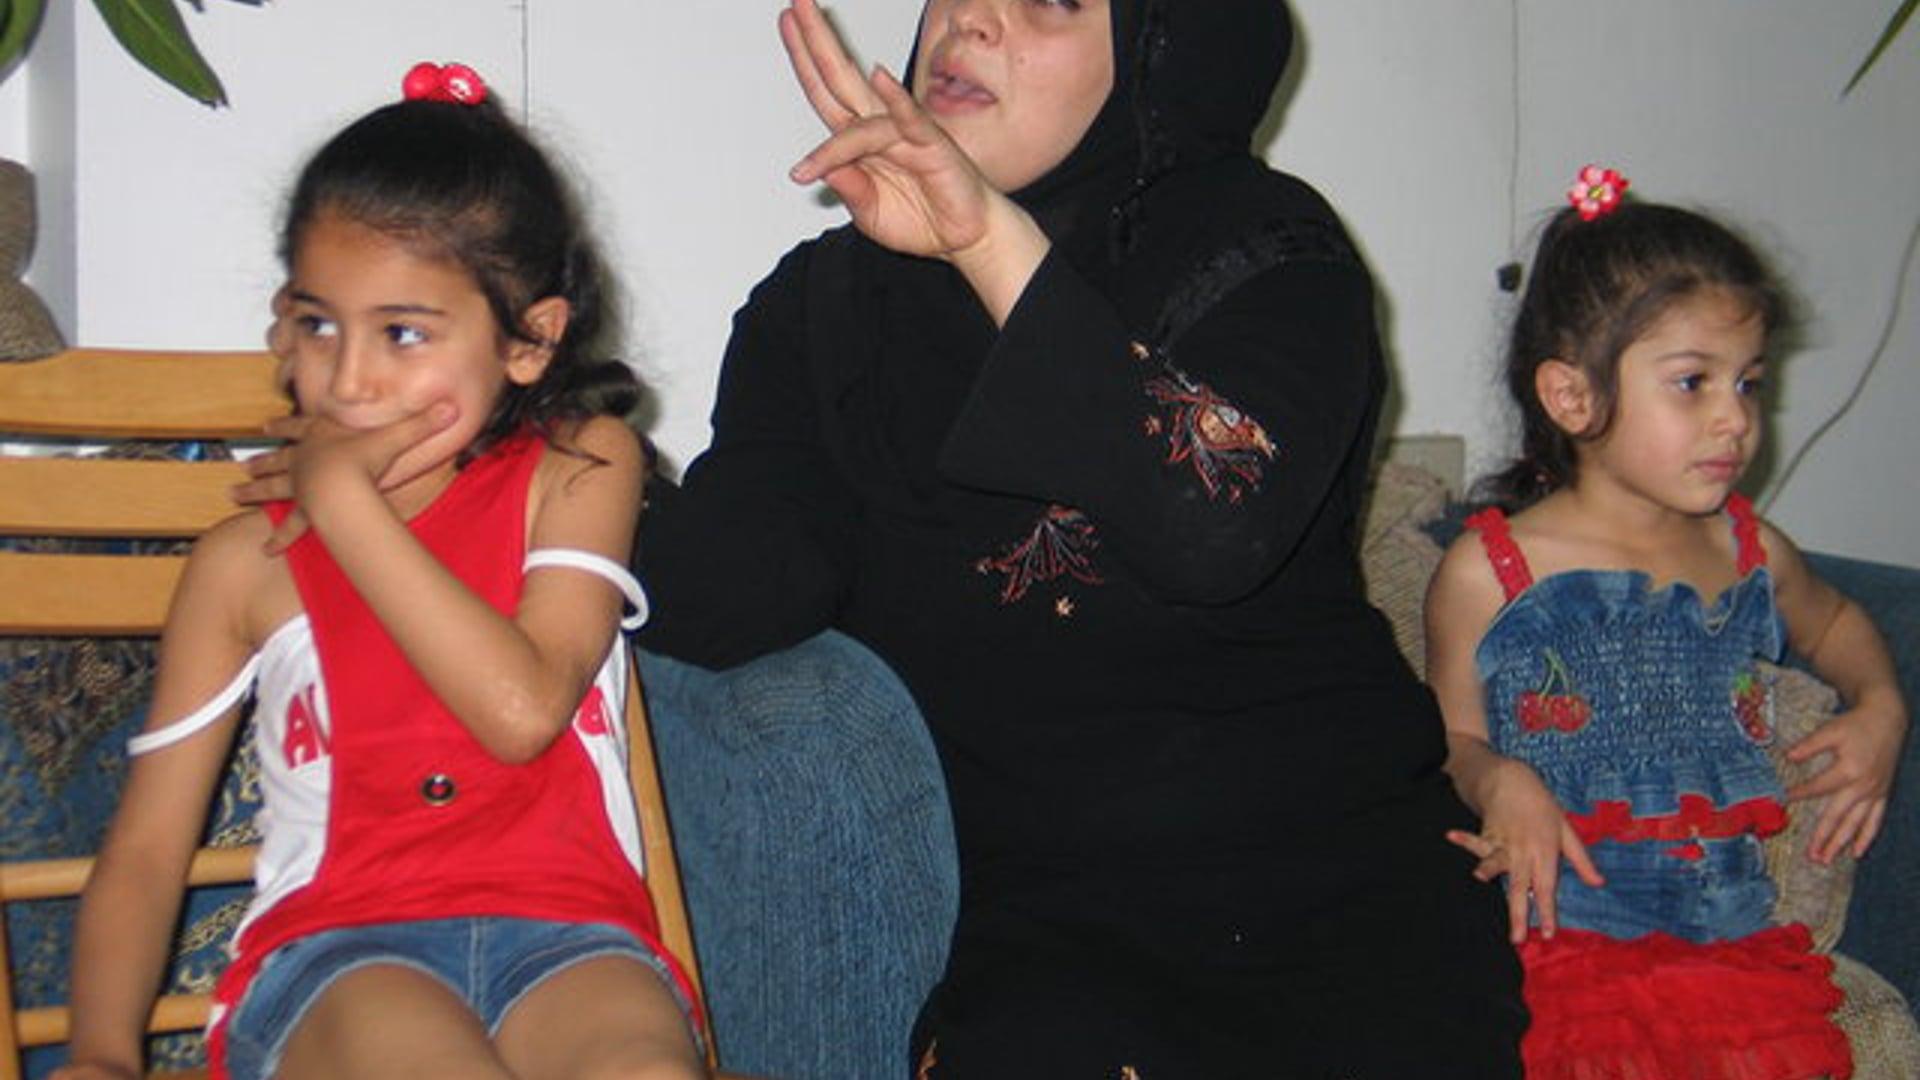 IRAQI REFUGEE Ikhlass